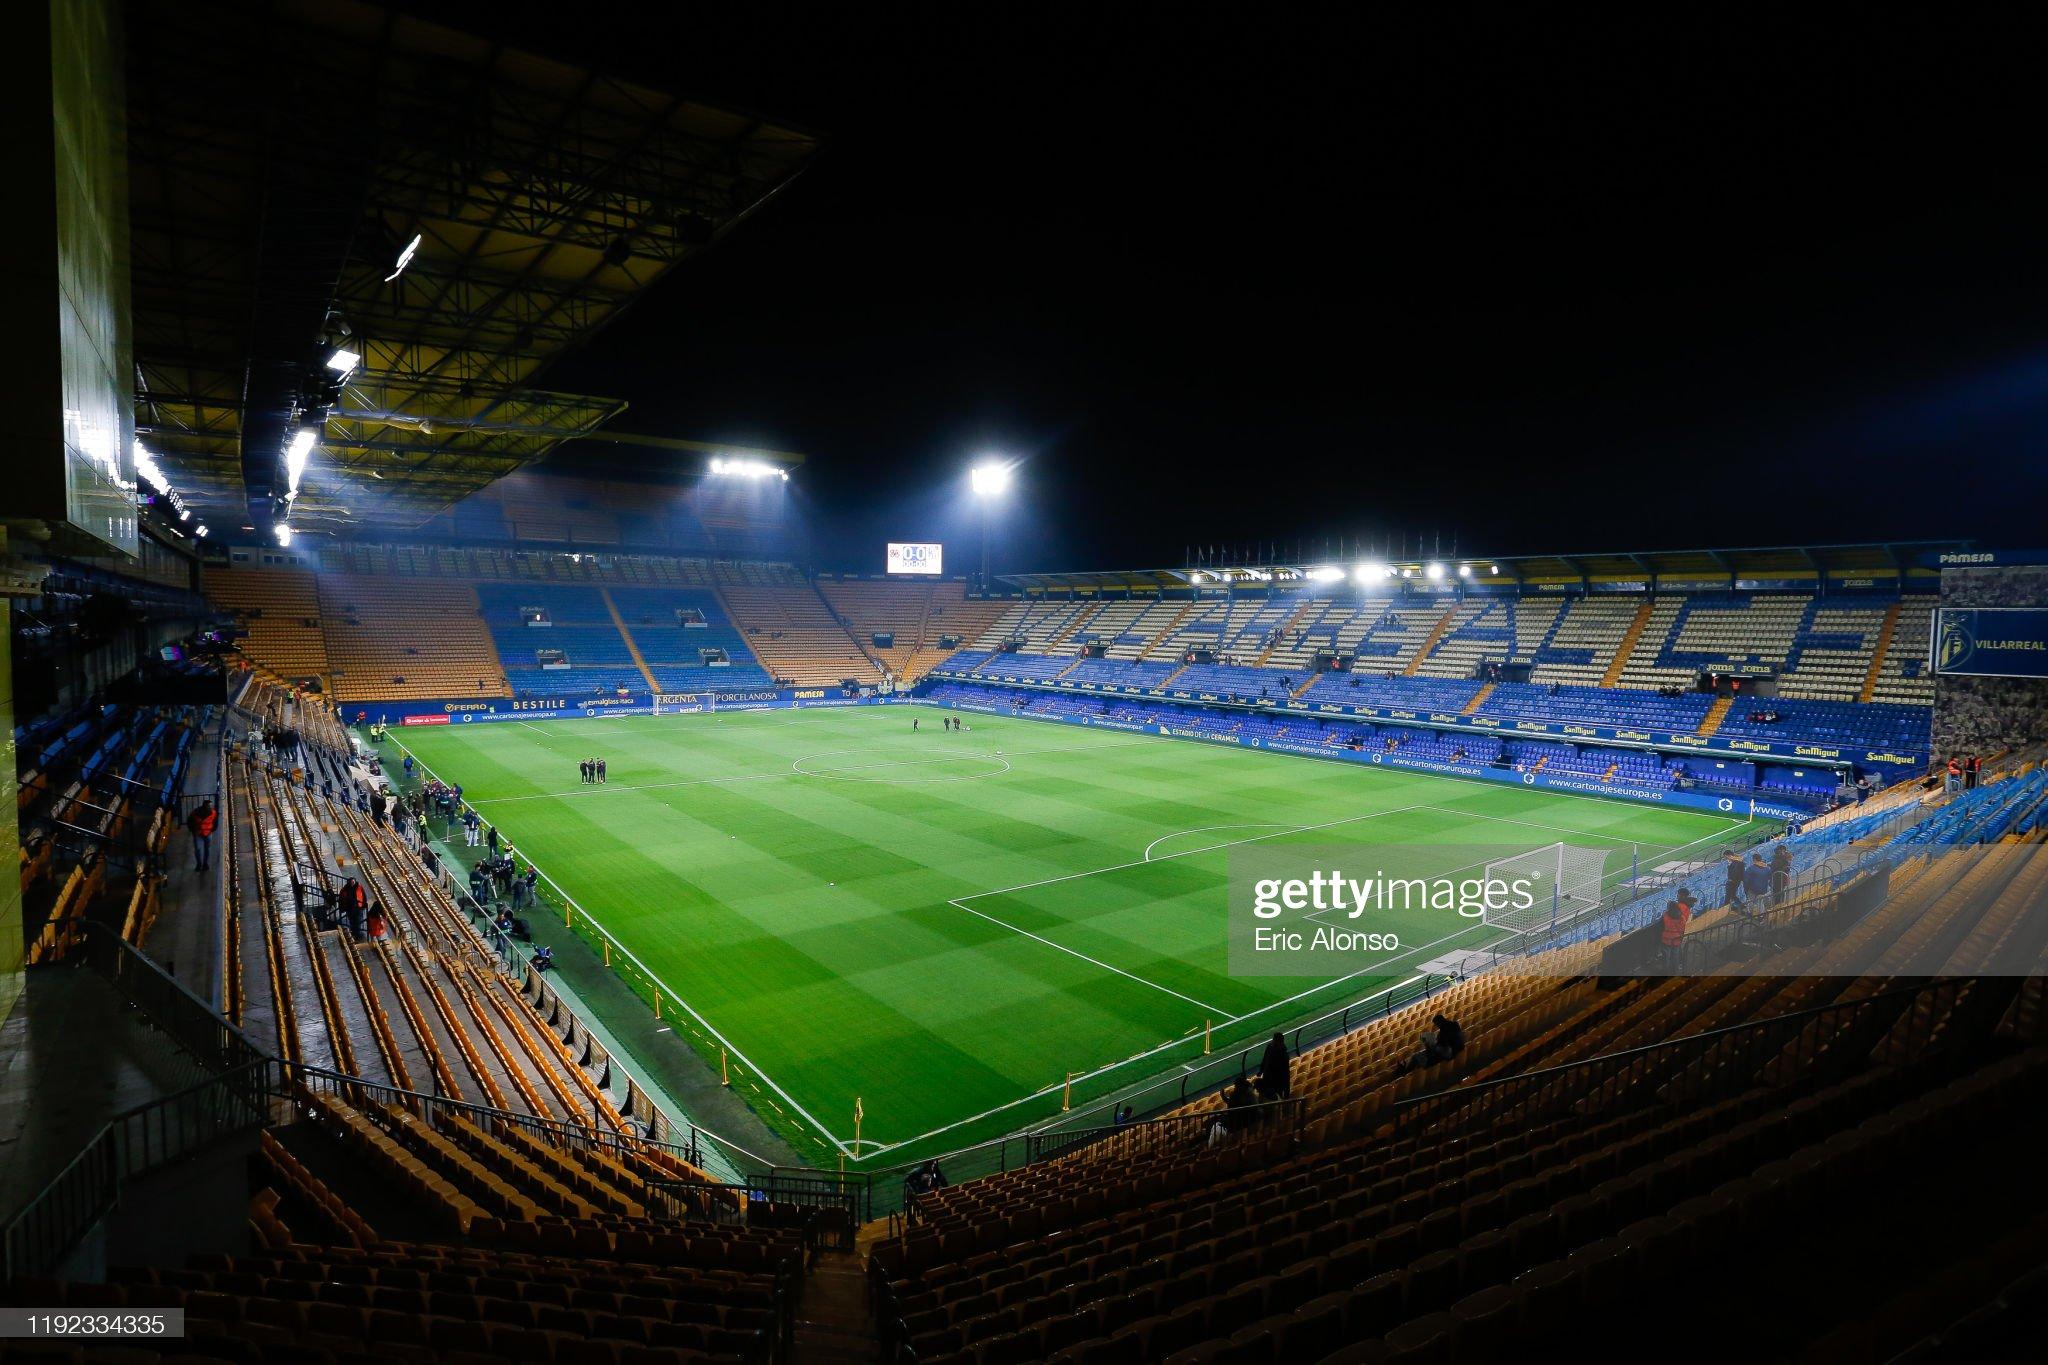 Villarreal vs Arsenal Preview, prediction and odds